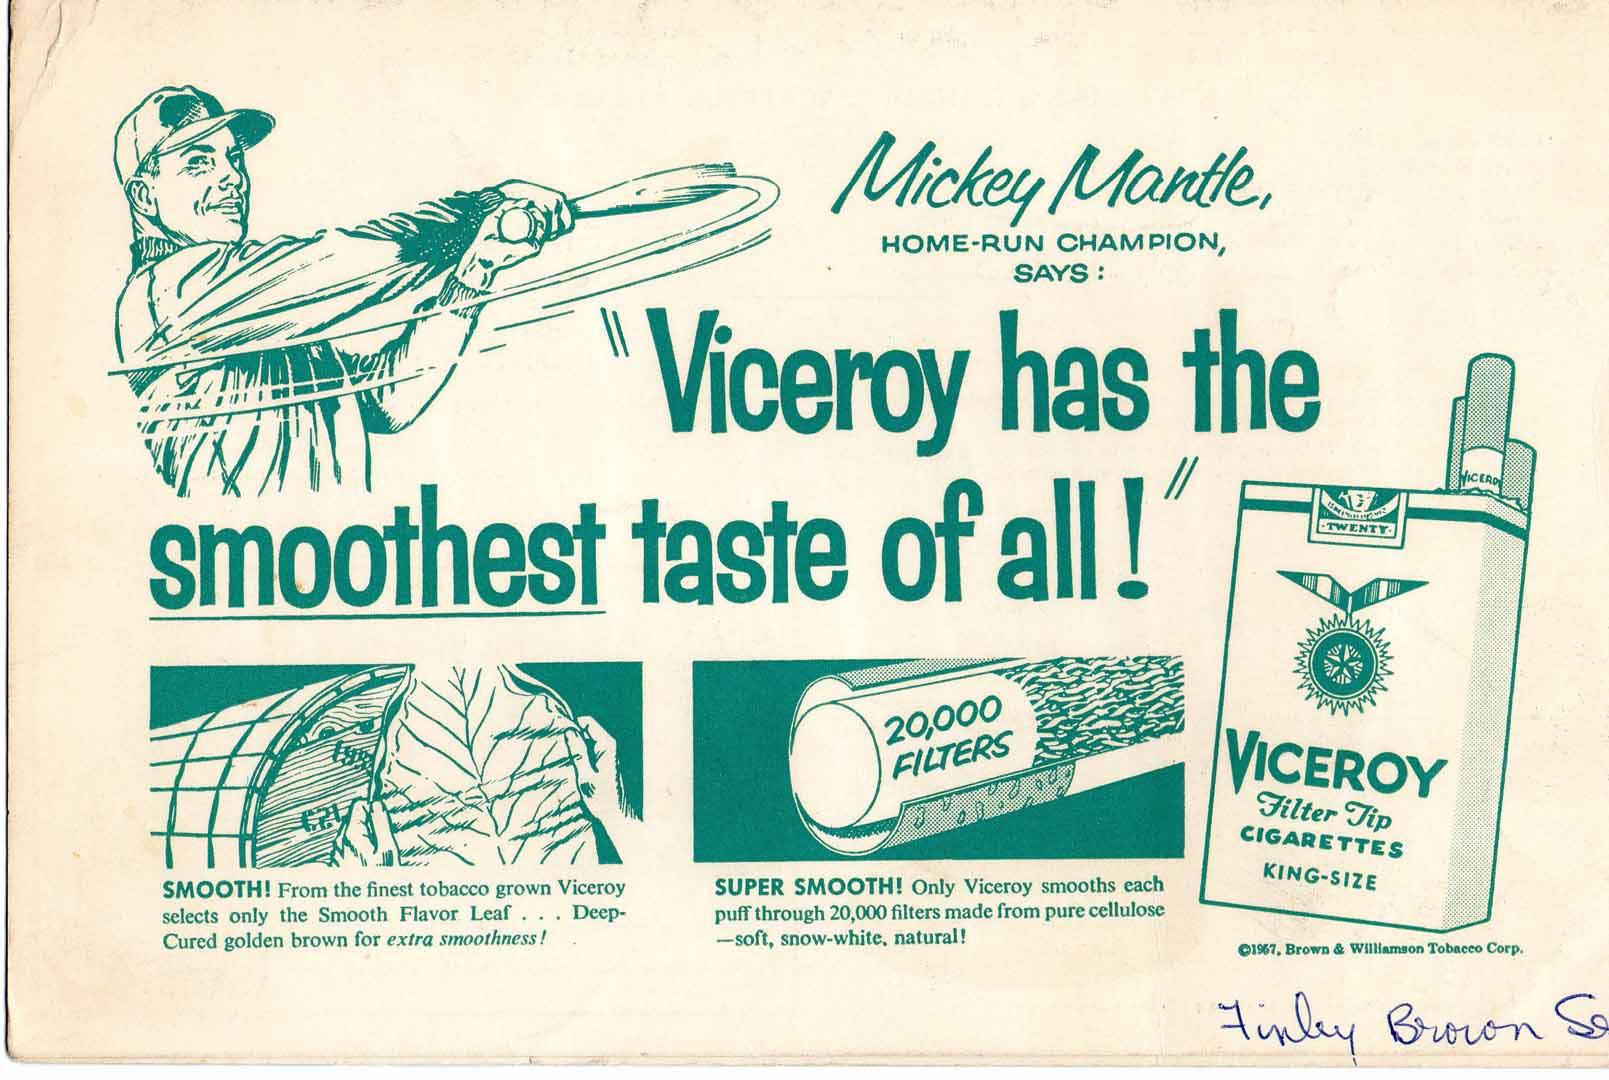 1957 wine list new york central 07/01